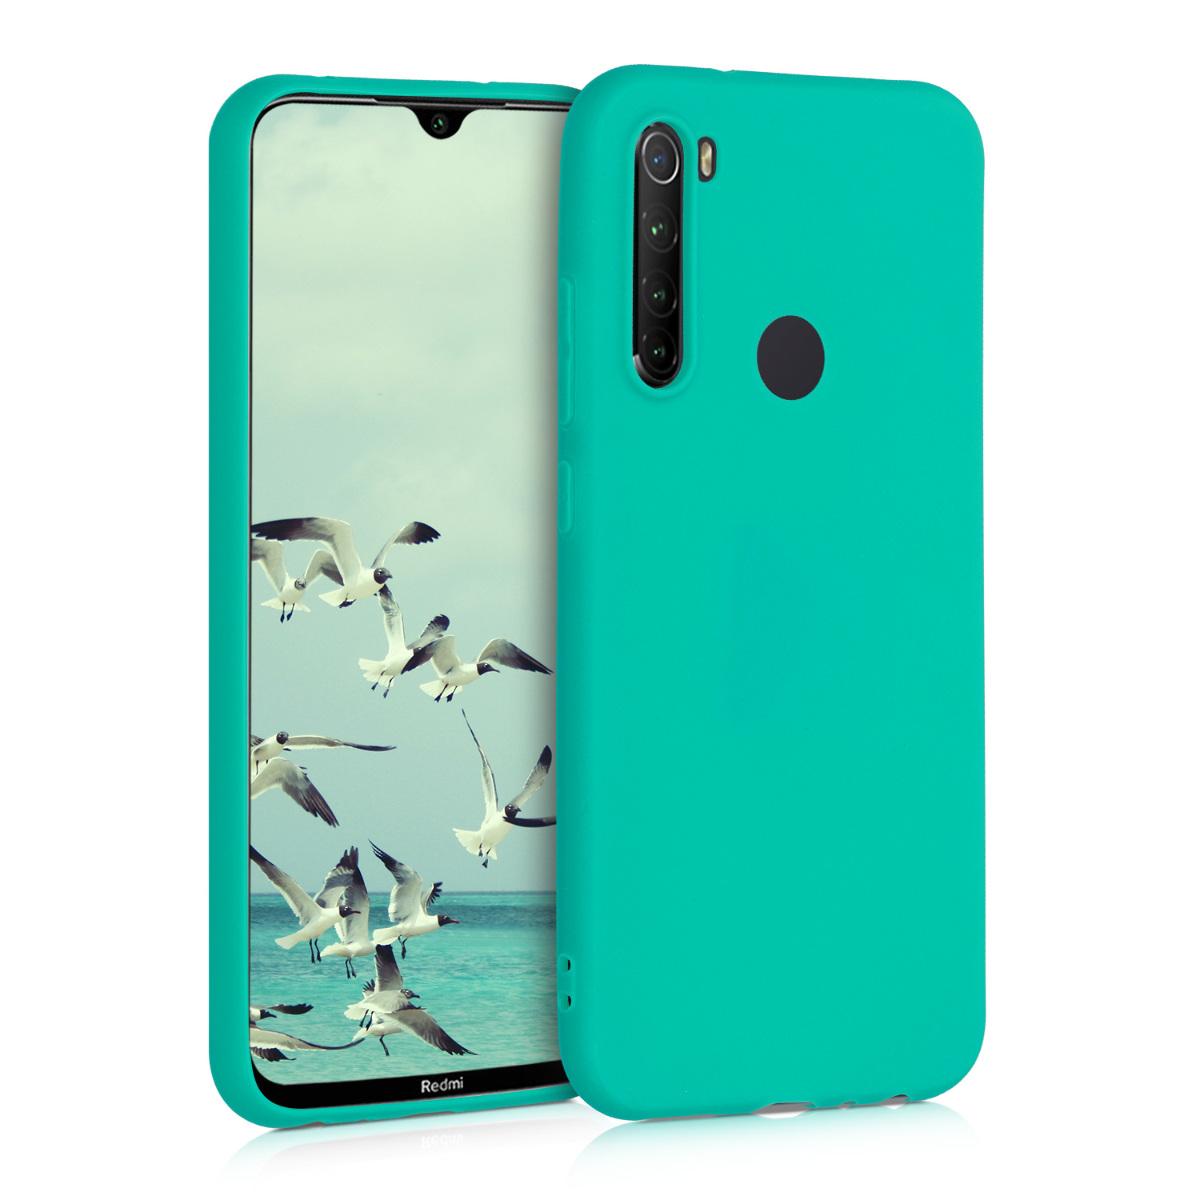 KW Θήκη Σιλικόνης Xiaomi Redmi Note 8 - Neon Turquoise (50190.126)